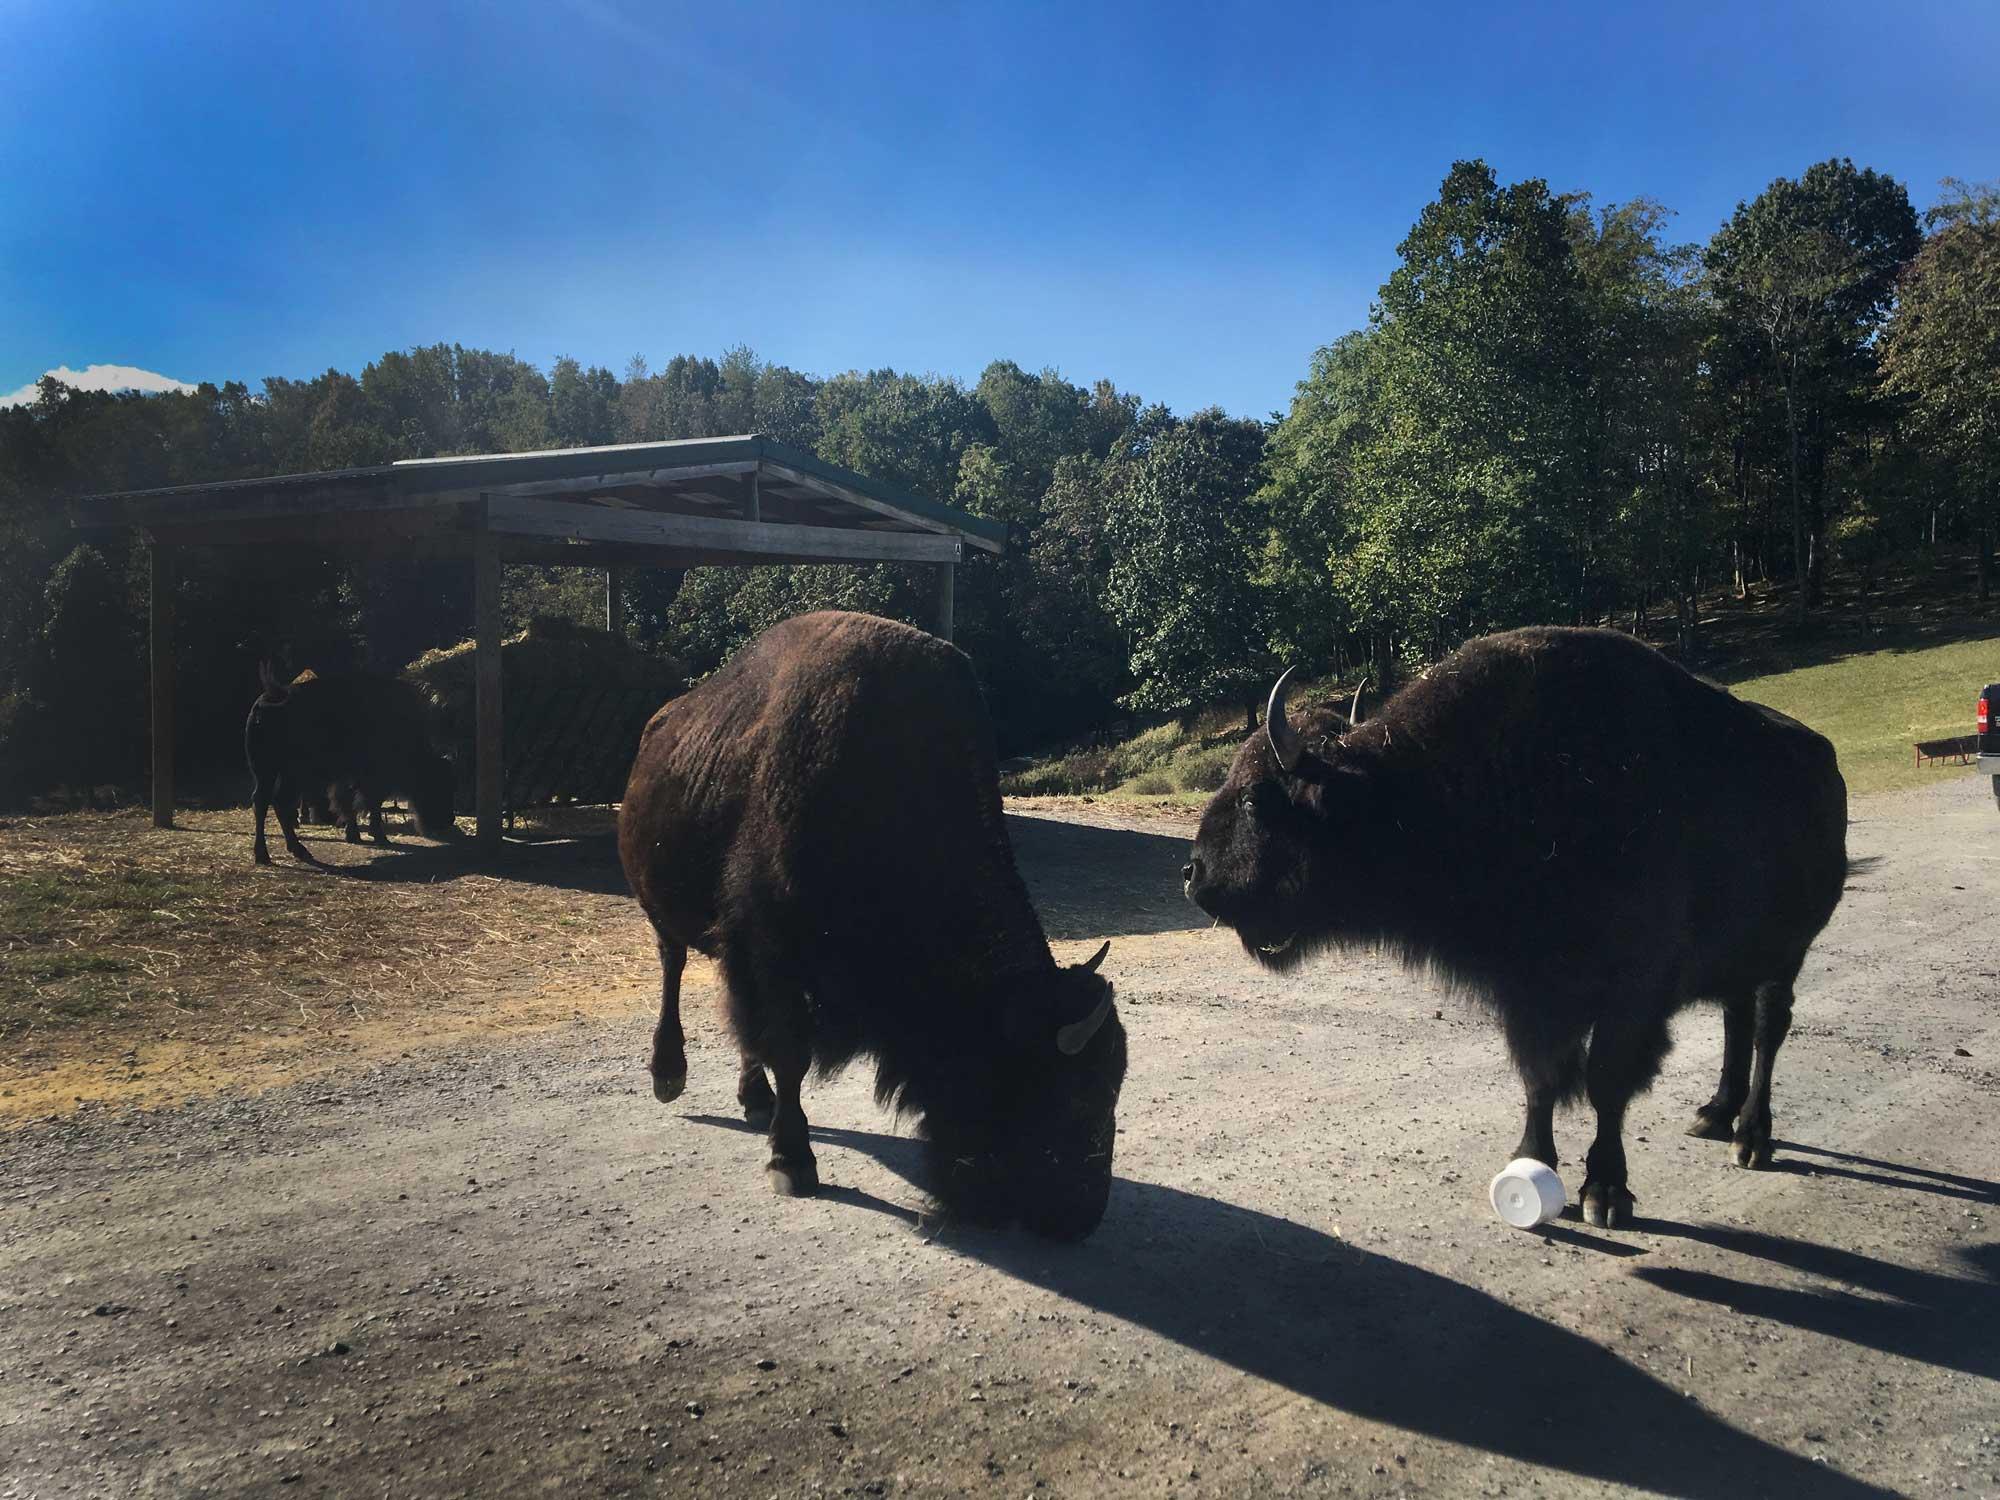 Two bison guarding a bucket at Virginia Safari Park, Natural Bridge, VA